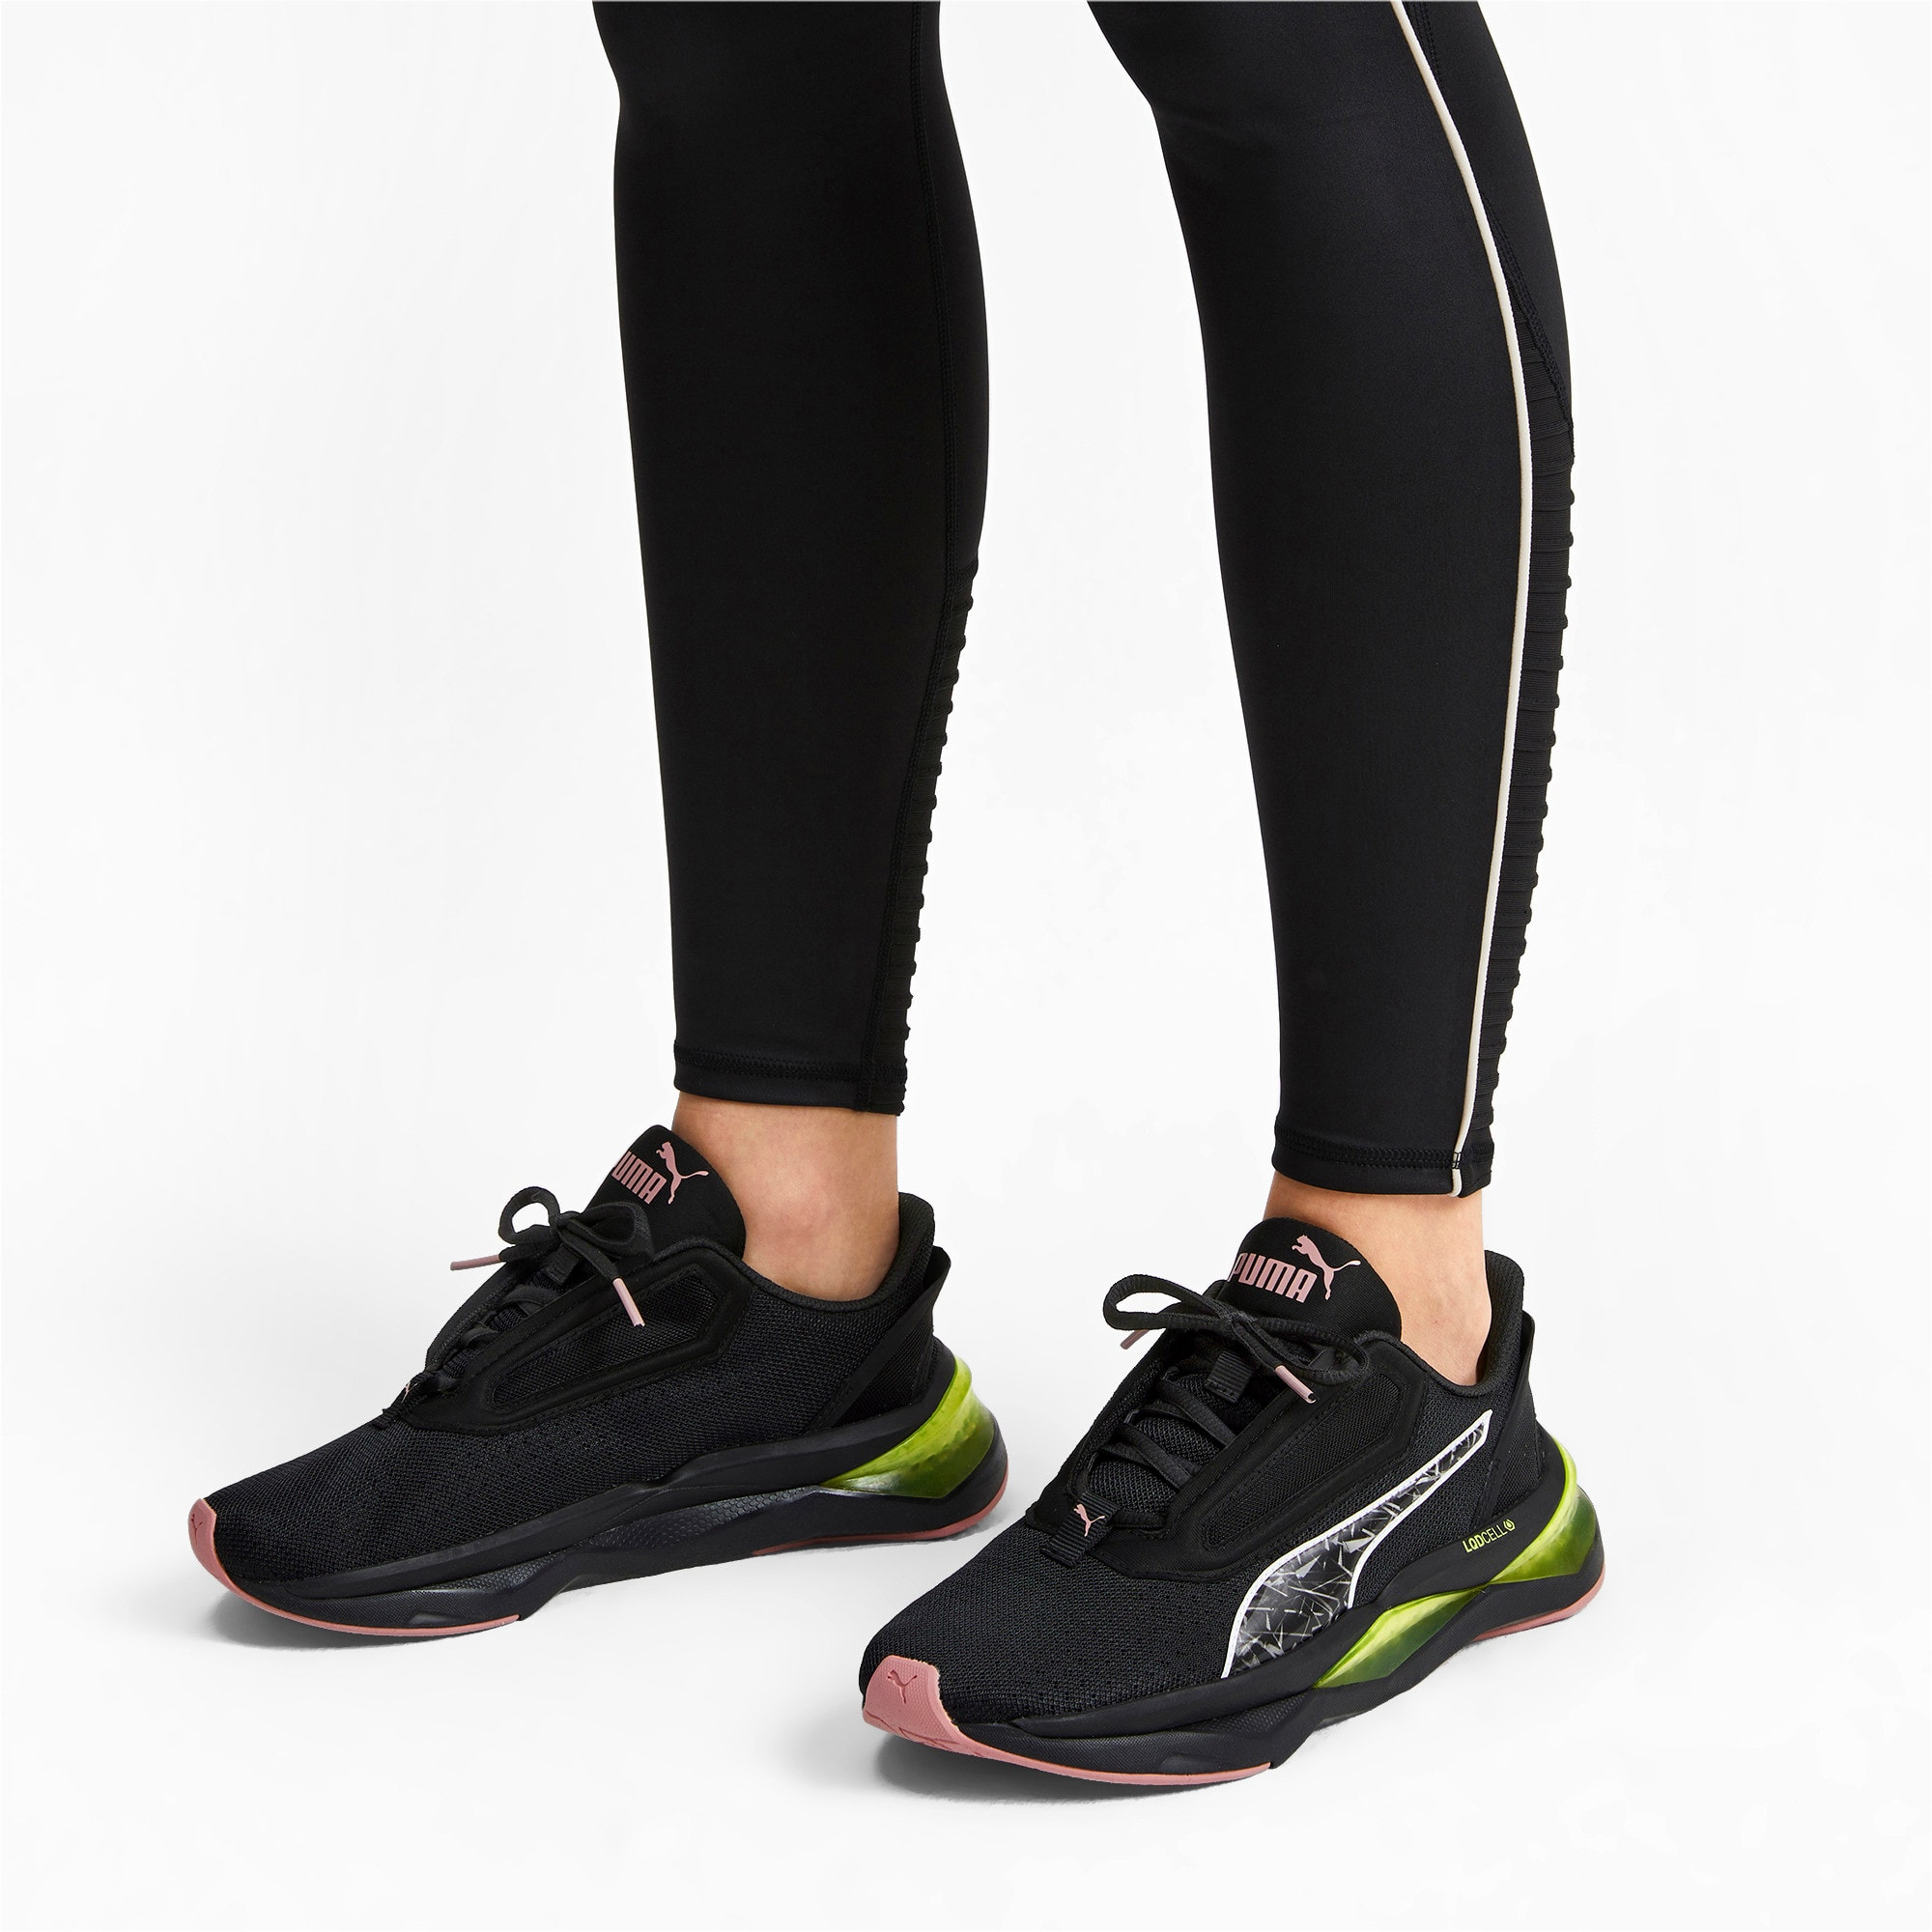 Thumbnail 3 of LQDCELL Shatter XT Women's Training Shoes, Puma Black-Yellow Alert, medium-IND